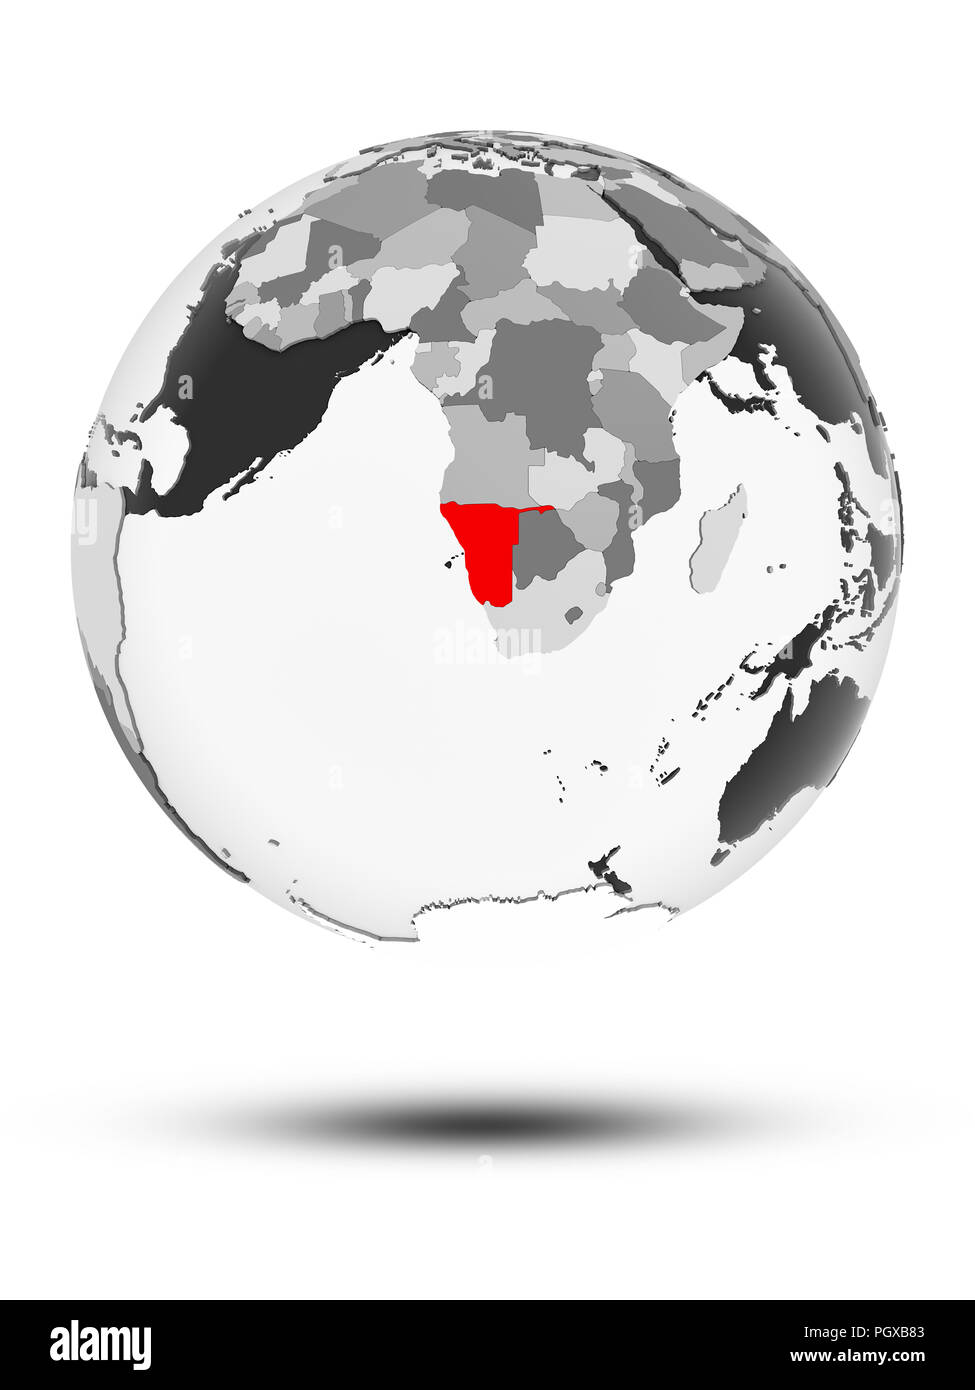 Namibia on globe with translucent oceans isolated on white background. 3D illustration. - Stock Image